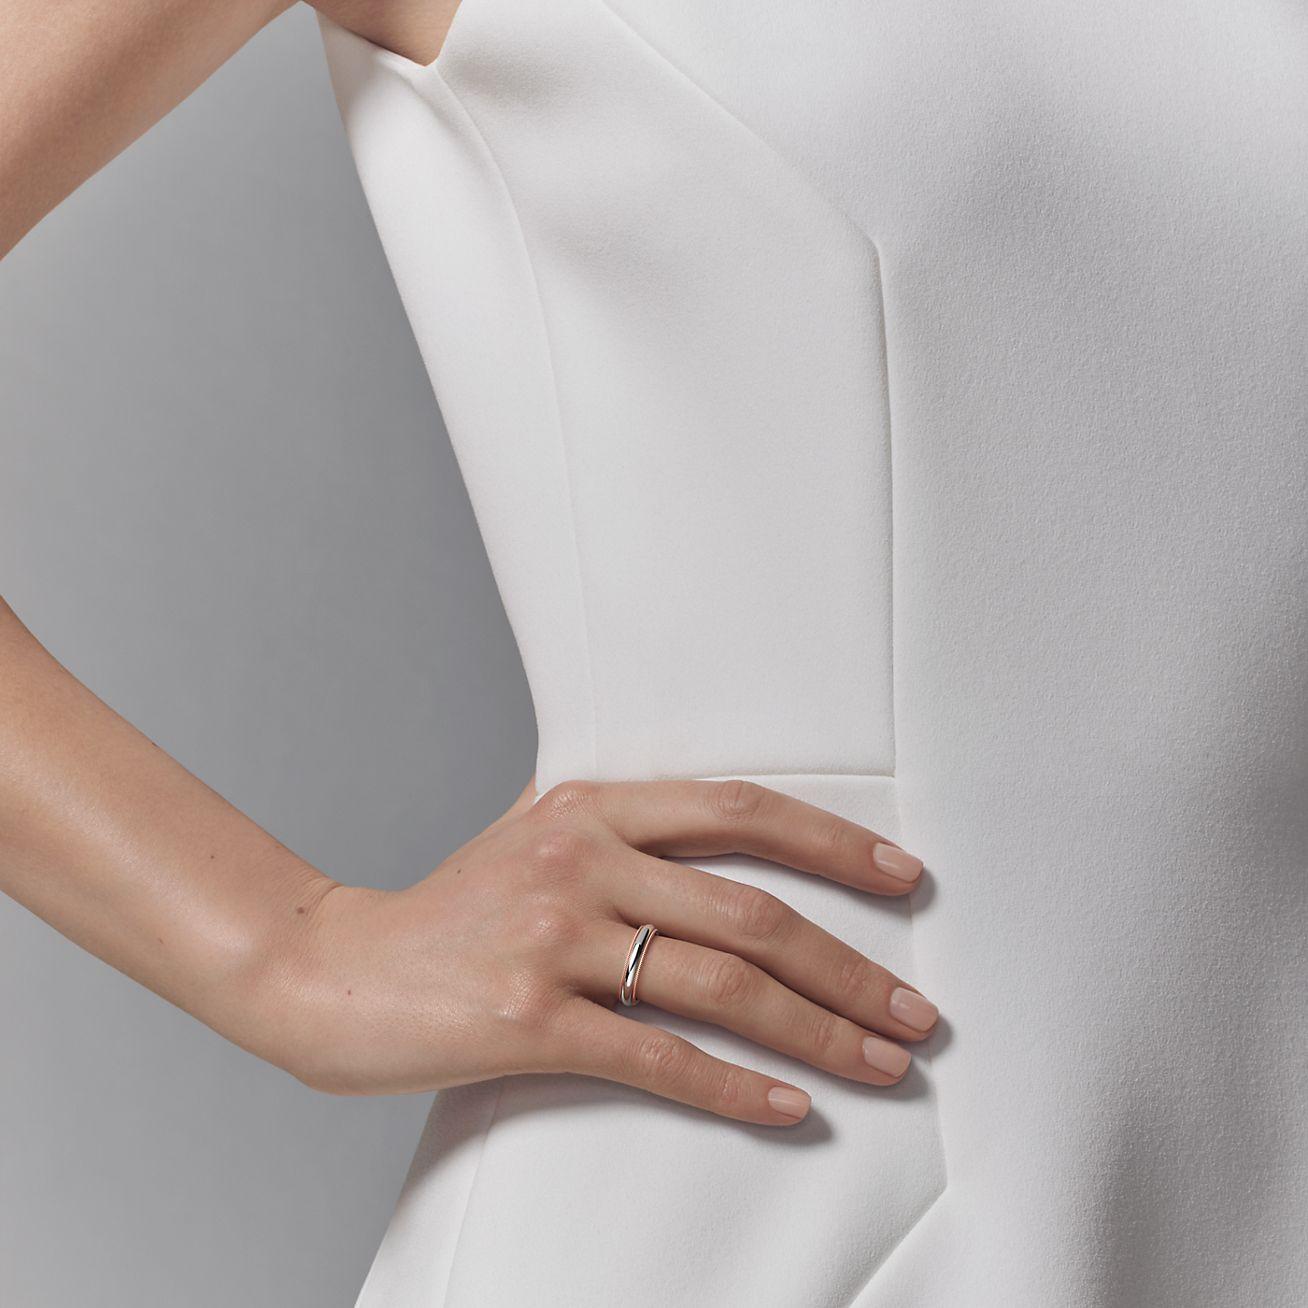 Milgrain Wedding Band   Tiffany Classic Milgrain Wedding Band Ring In Platinum And 18ct